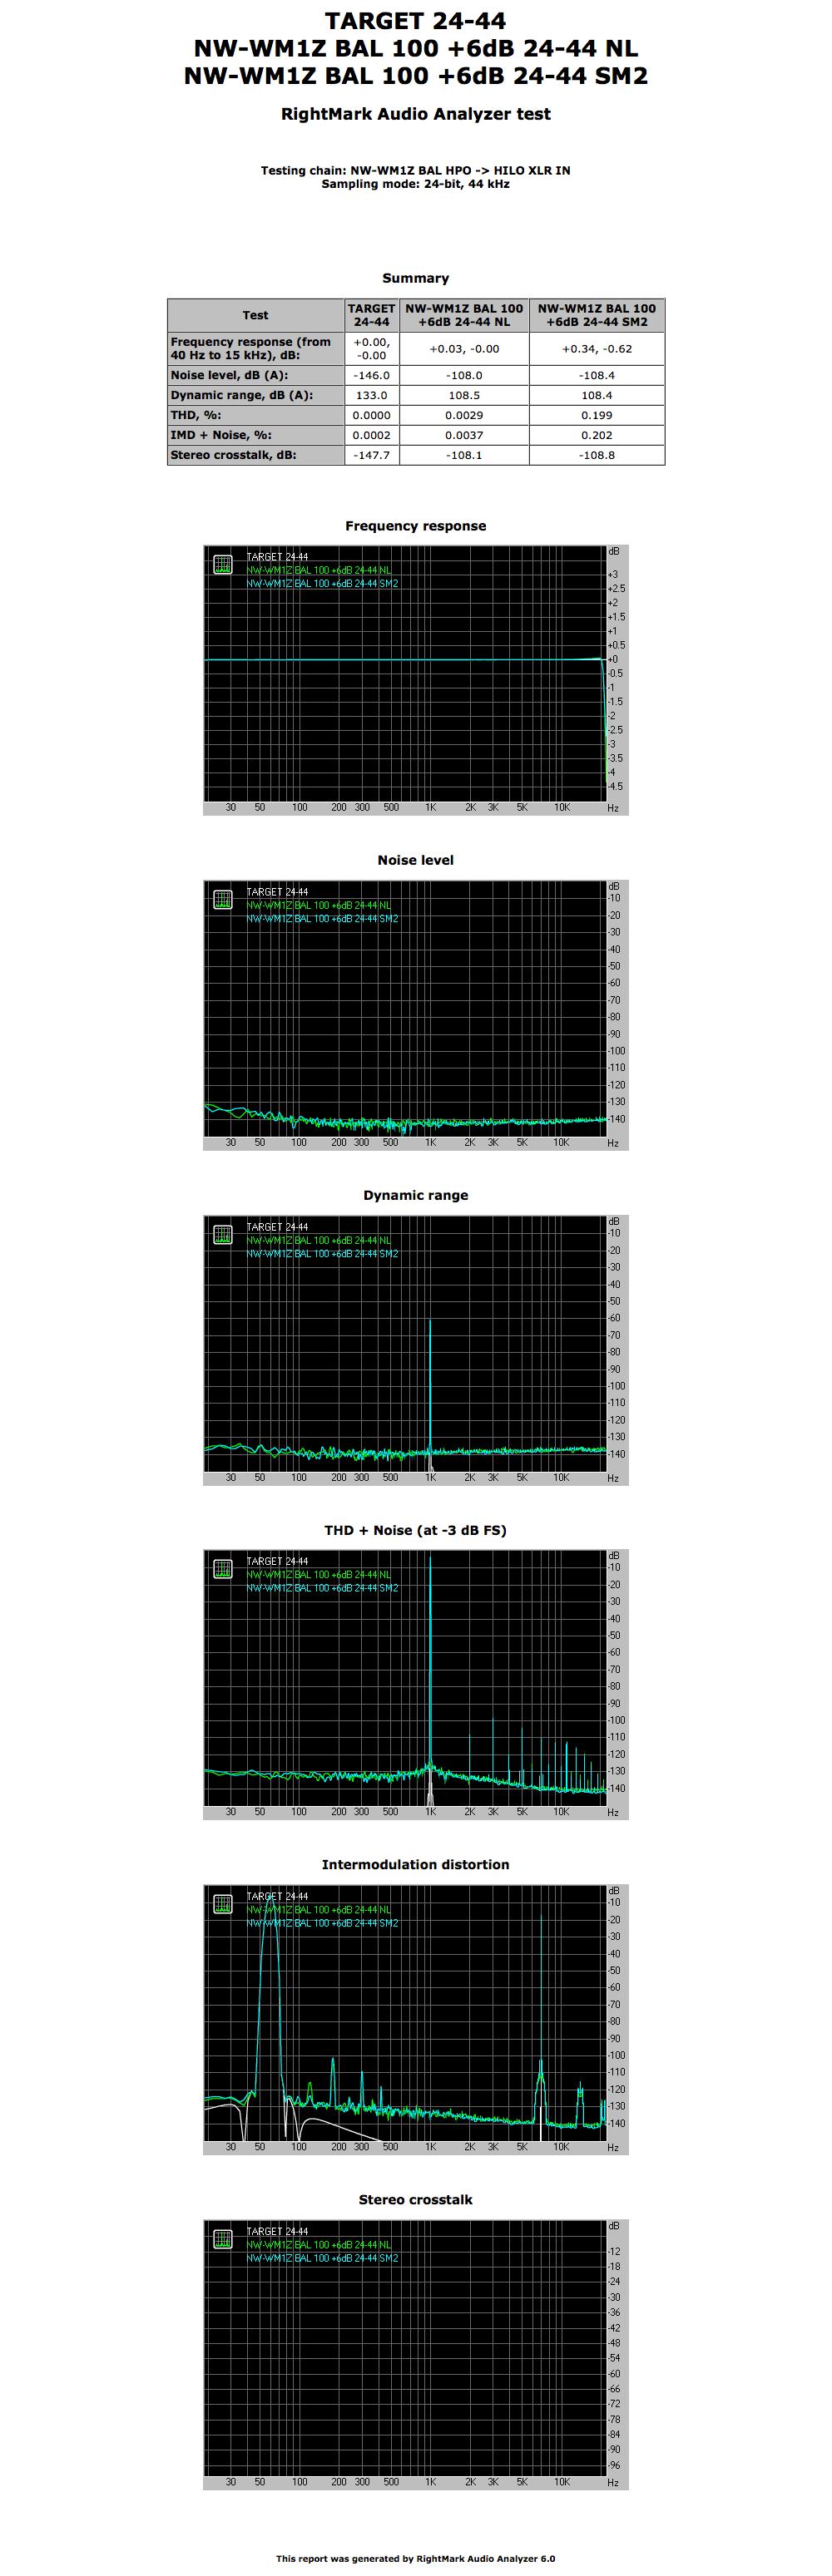 RMAA-BAL-NW-WM1Z-24-44-all-targets.png